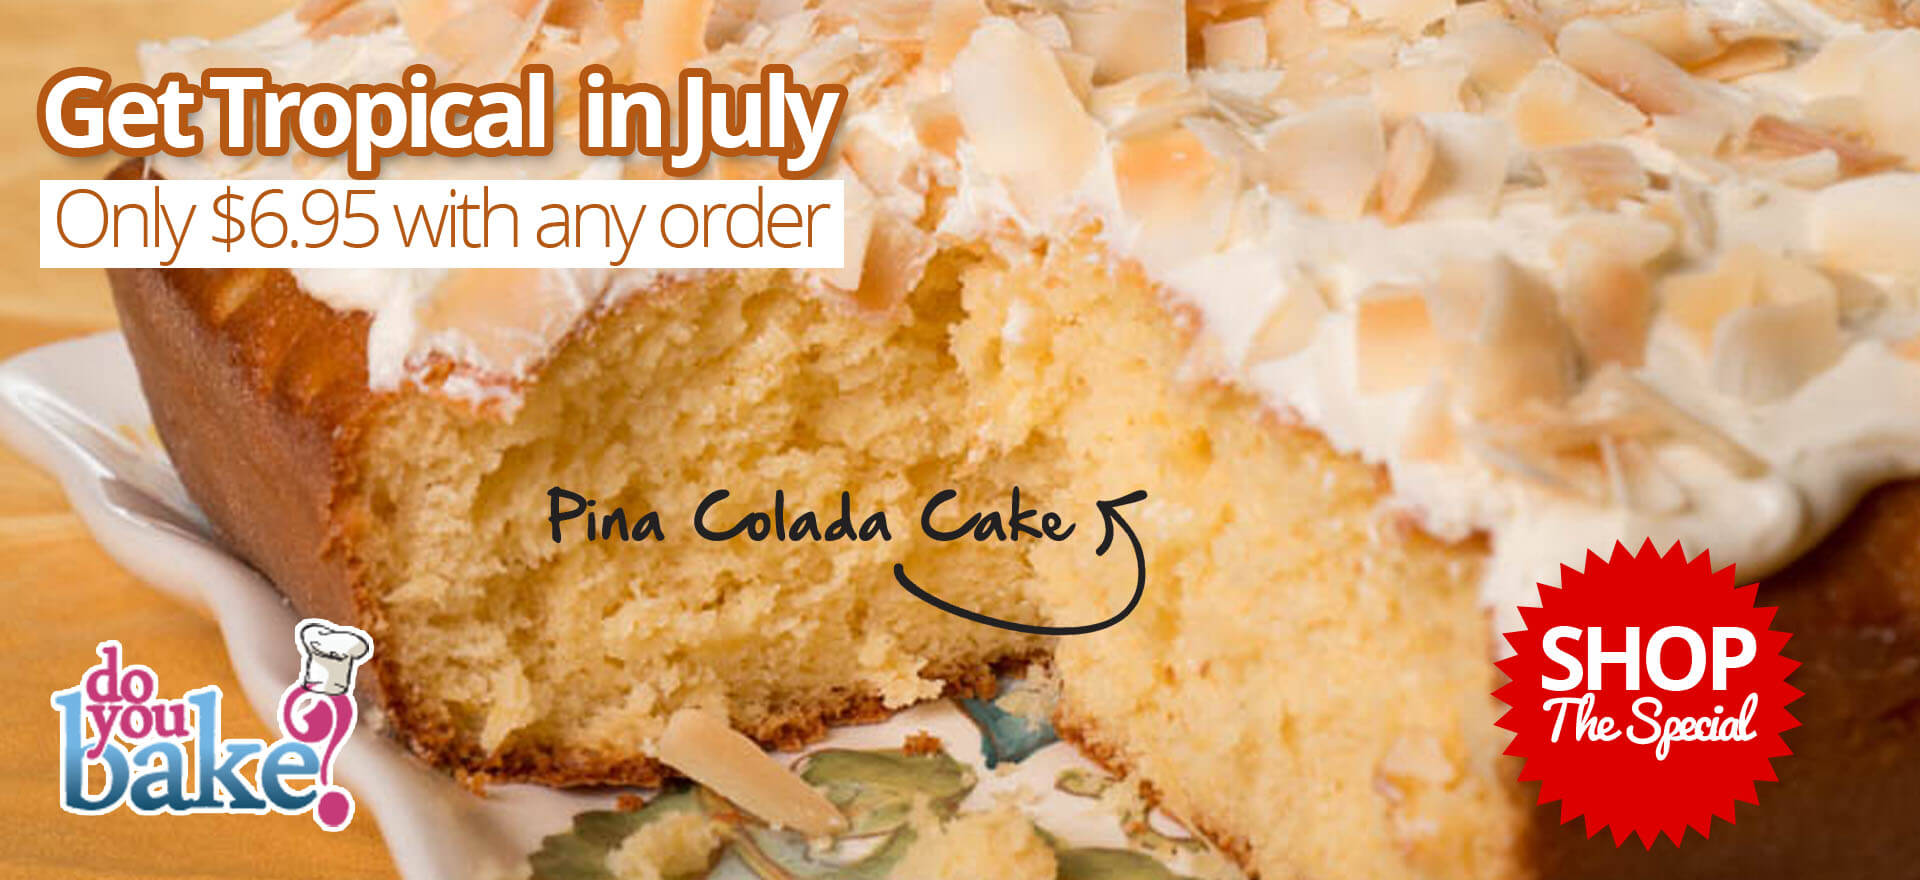 7-Customer-Special-Pina-Colada-Cake-Banner-Website